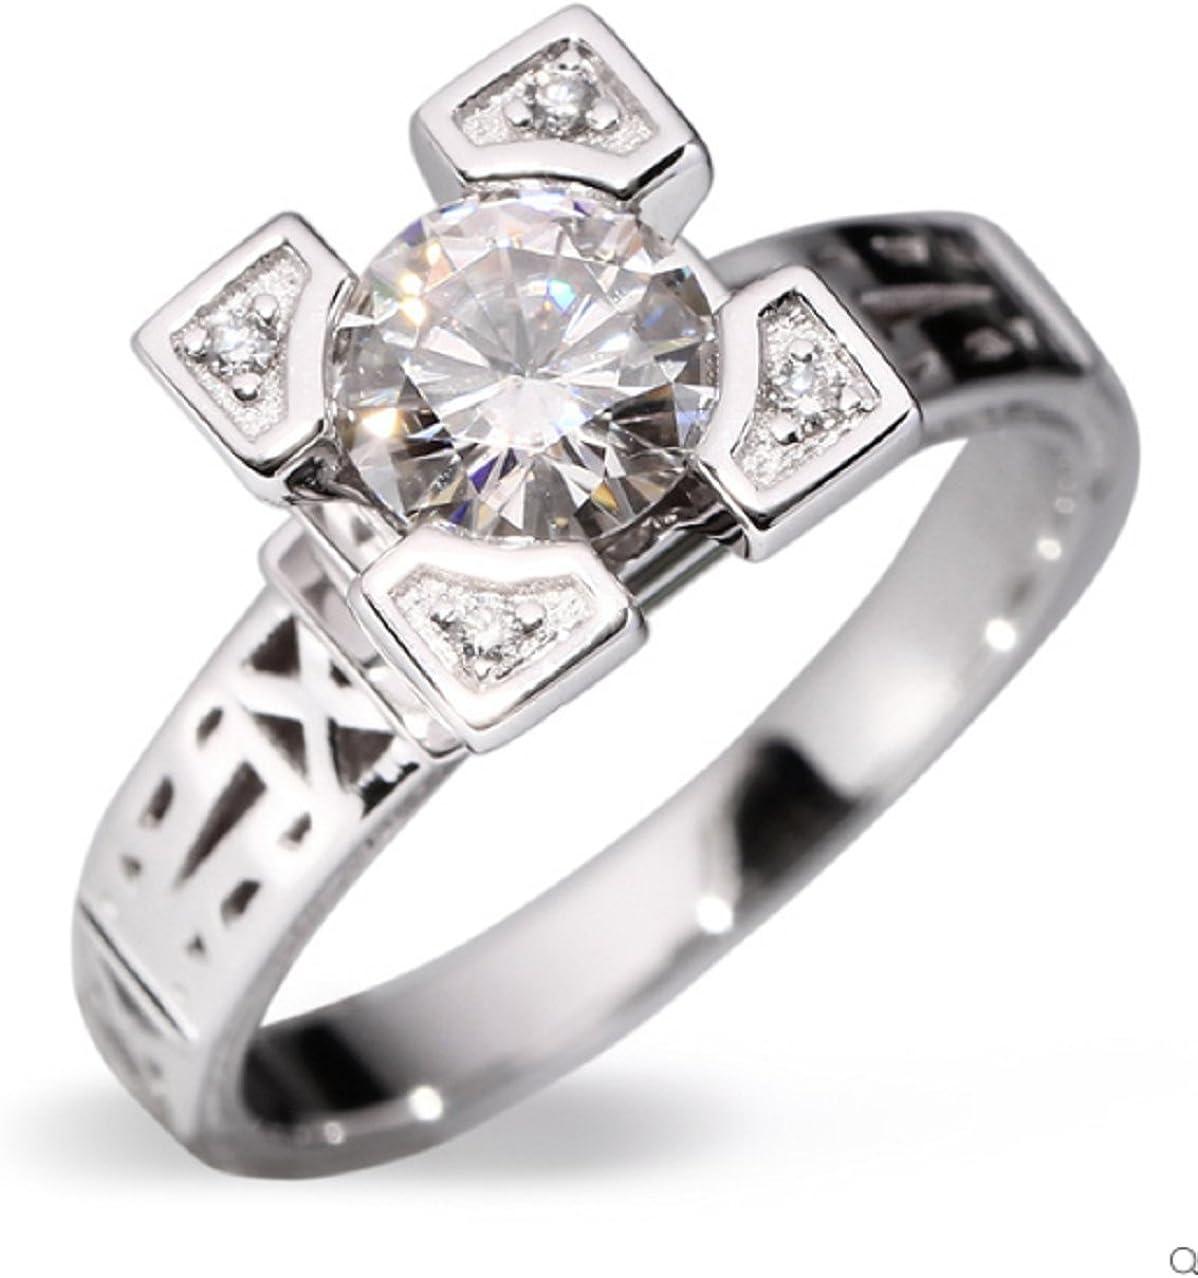 Gowe Engagement Ring 1 ct F Farbe VVS Klarheit Frauen Ringe